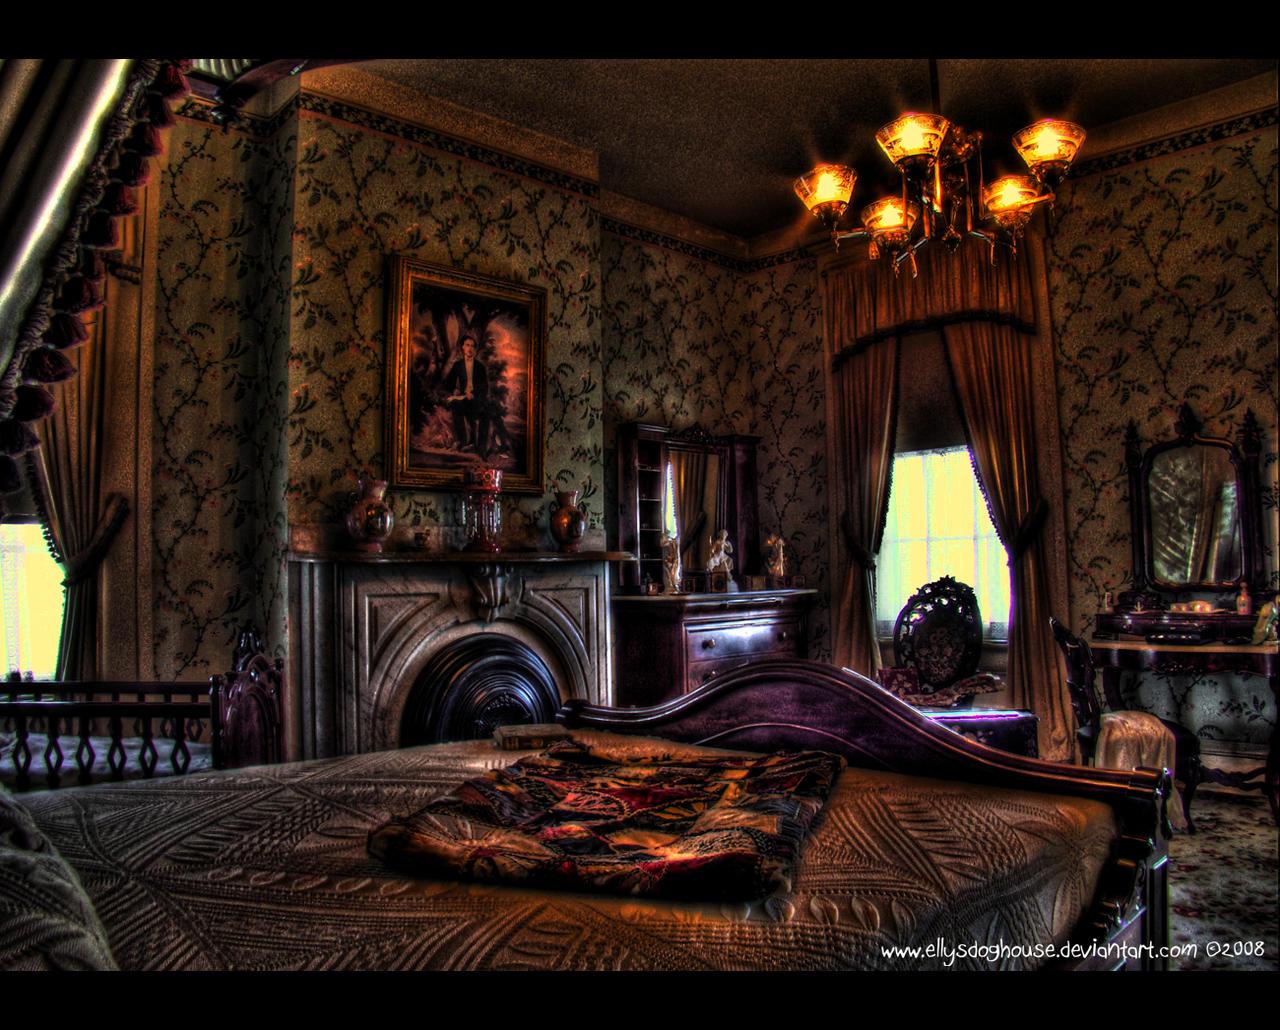 DeMenil Mansion - Bedroom by ellysdoghouse on DeviantArt